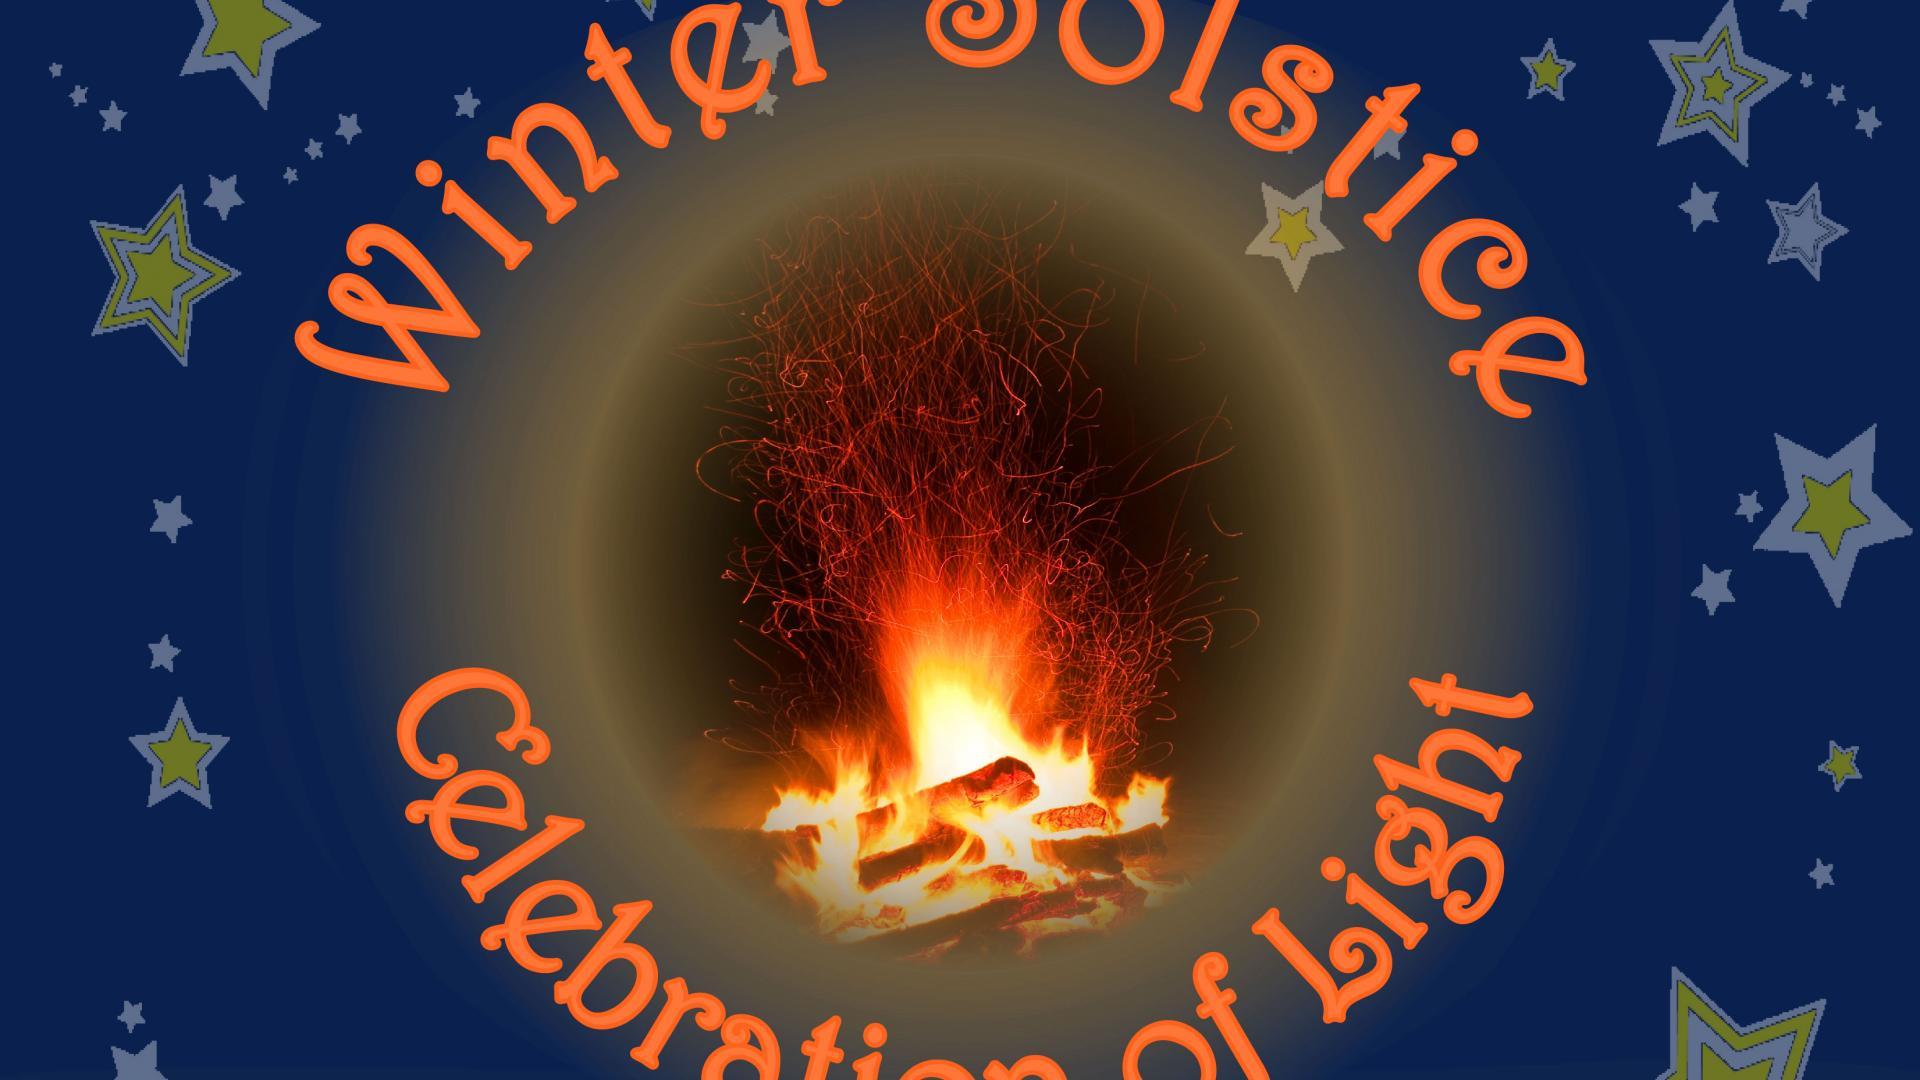 2017 clipart winter solstice. X carwad net